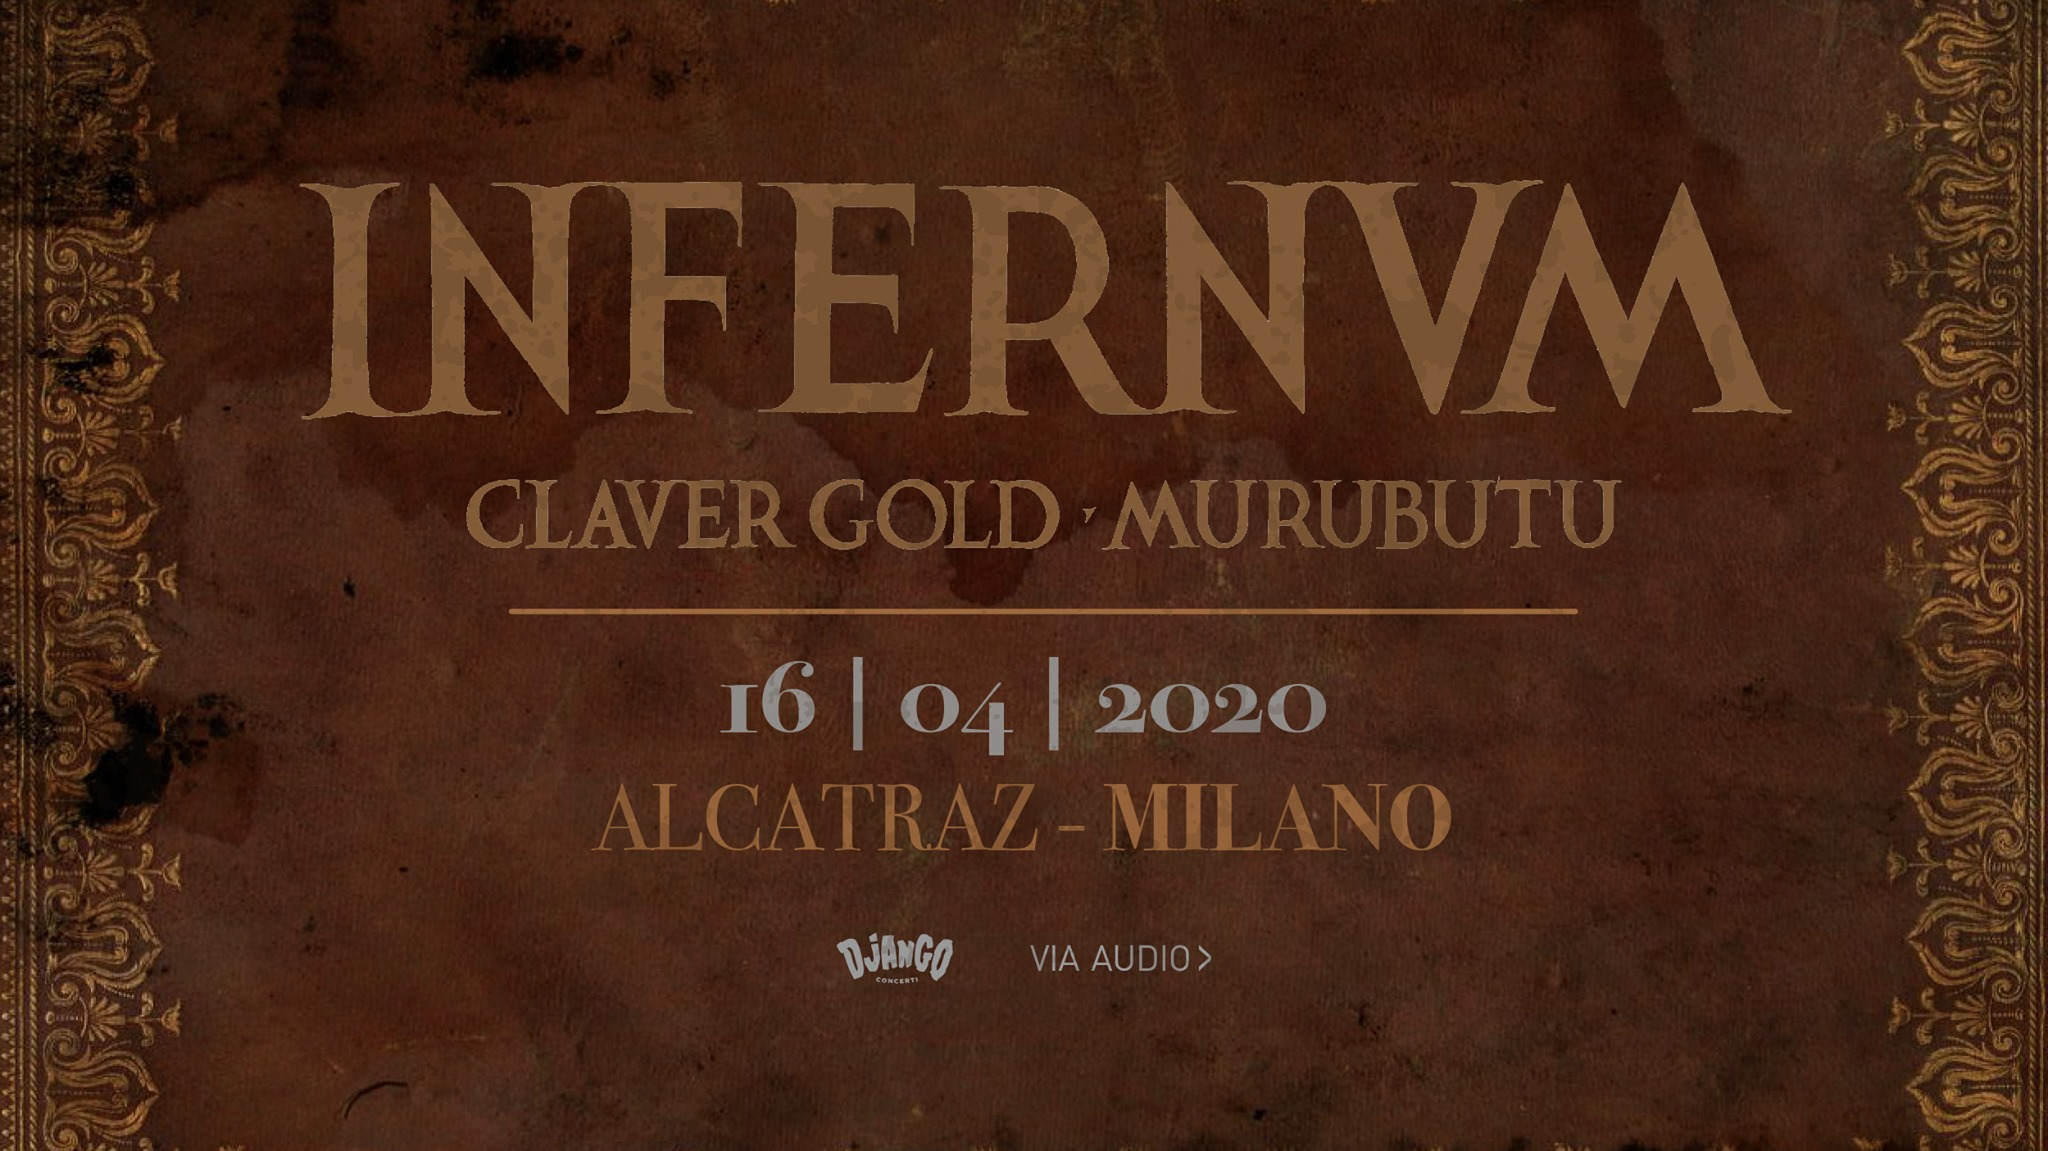 clavergold-murubutu-alcatraz-milano